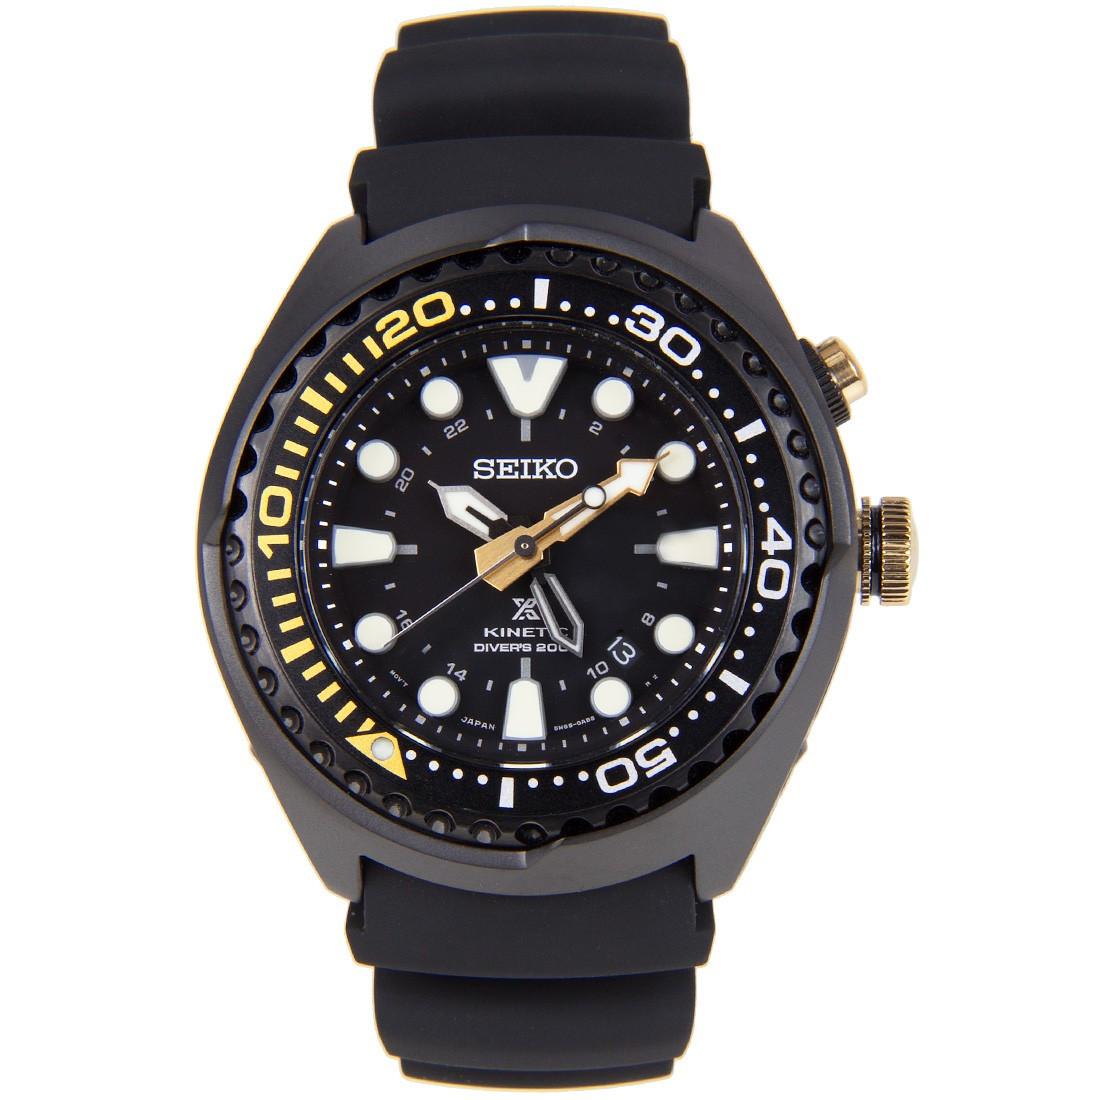 Часы Seiko SUN045P1 Prospex Kinetic Diver's